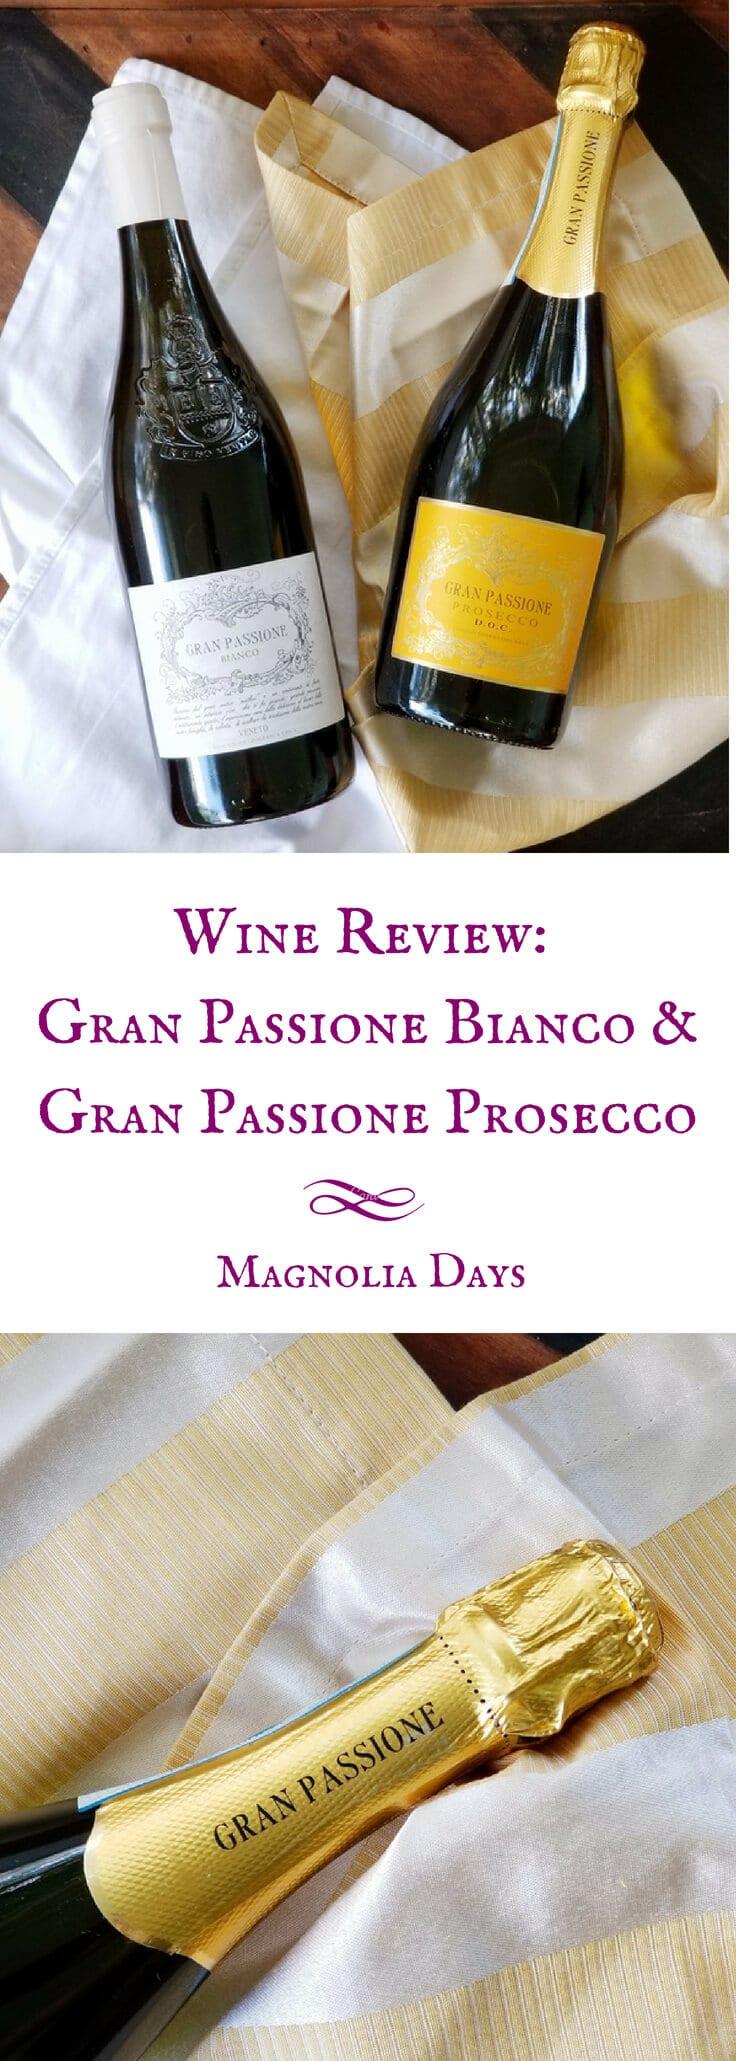 A review of Gran Passione Bianco (a white wine blend) and Gran Passione Prosecco DOC Spumante. Both wines originate from Veneto region of Italy.